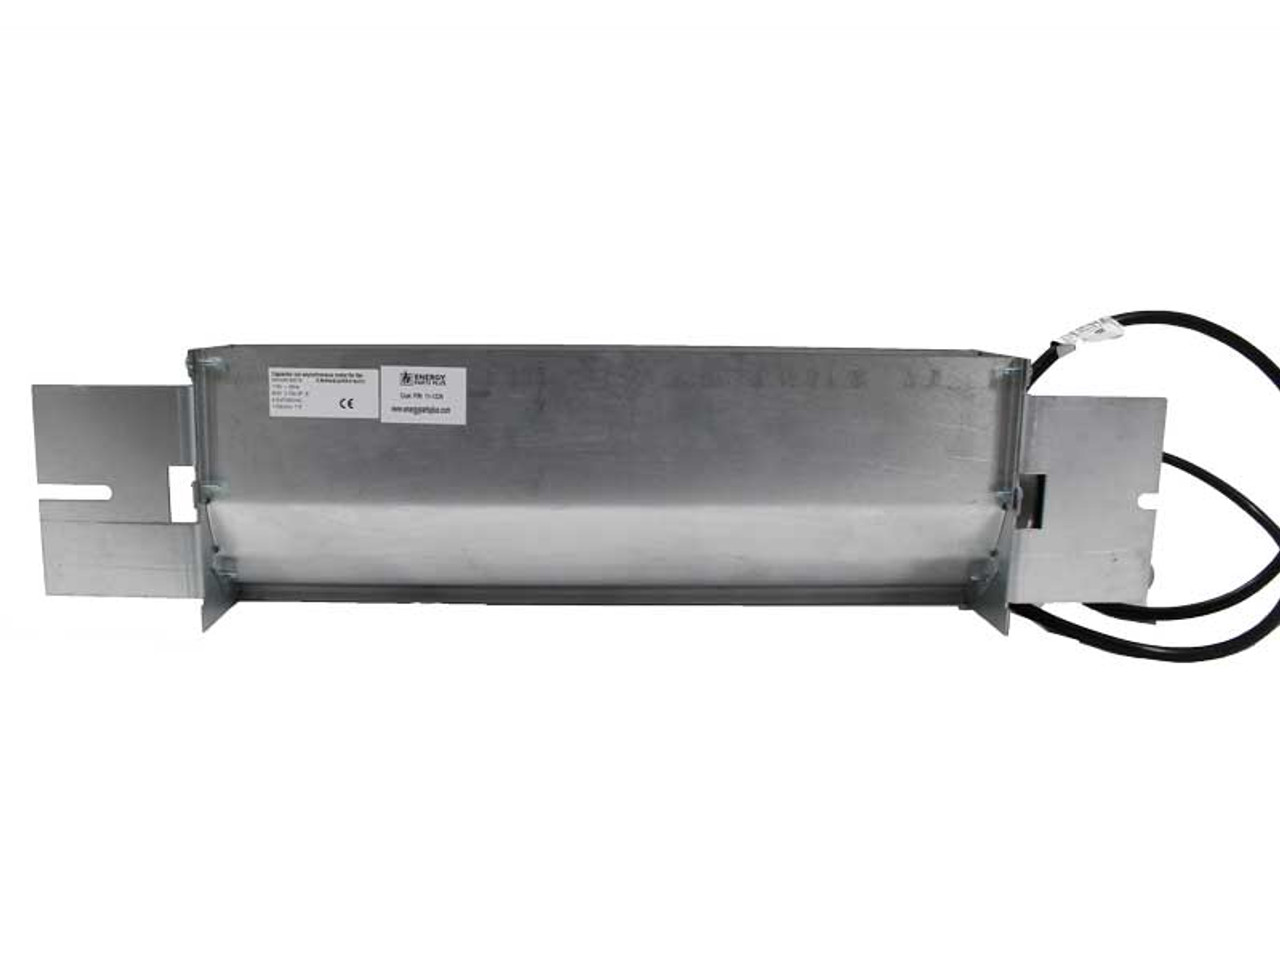 Enviro M55, VF55 & Regency GC60 Convection Blower (11-1224)